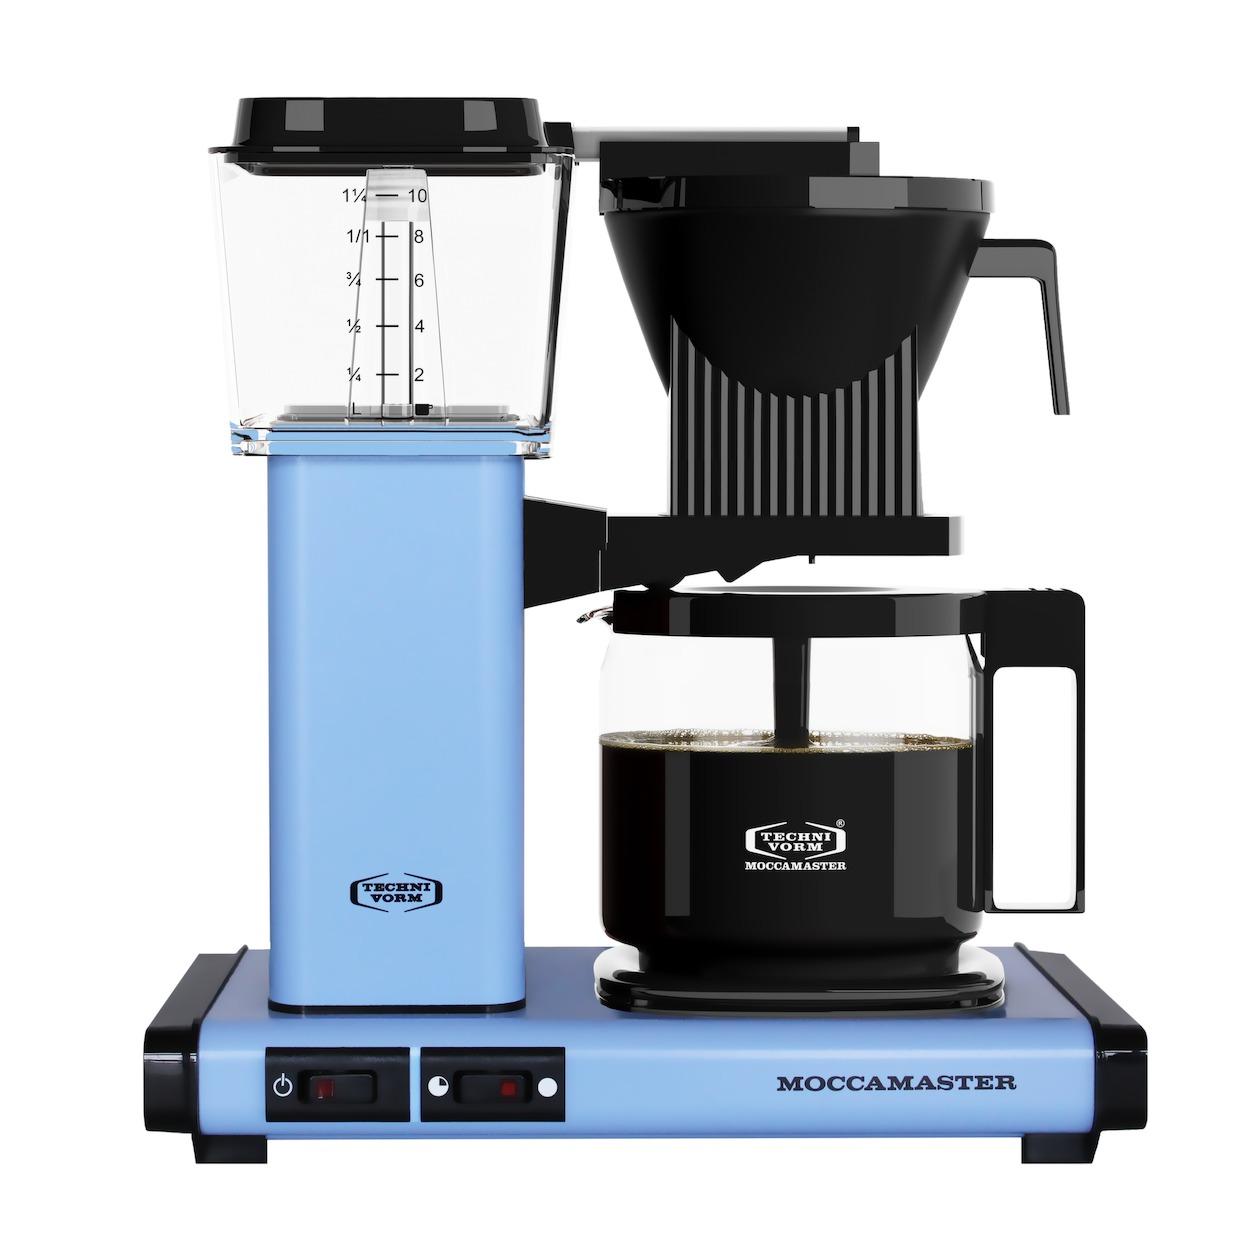 Moccamaster koffiefilter apparaat KBG741 AO pastelblauw